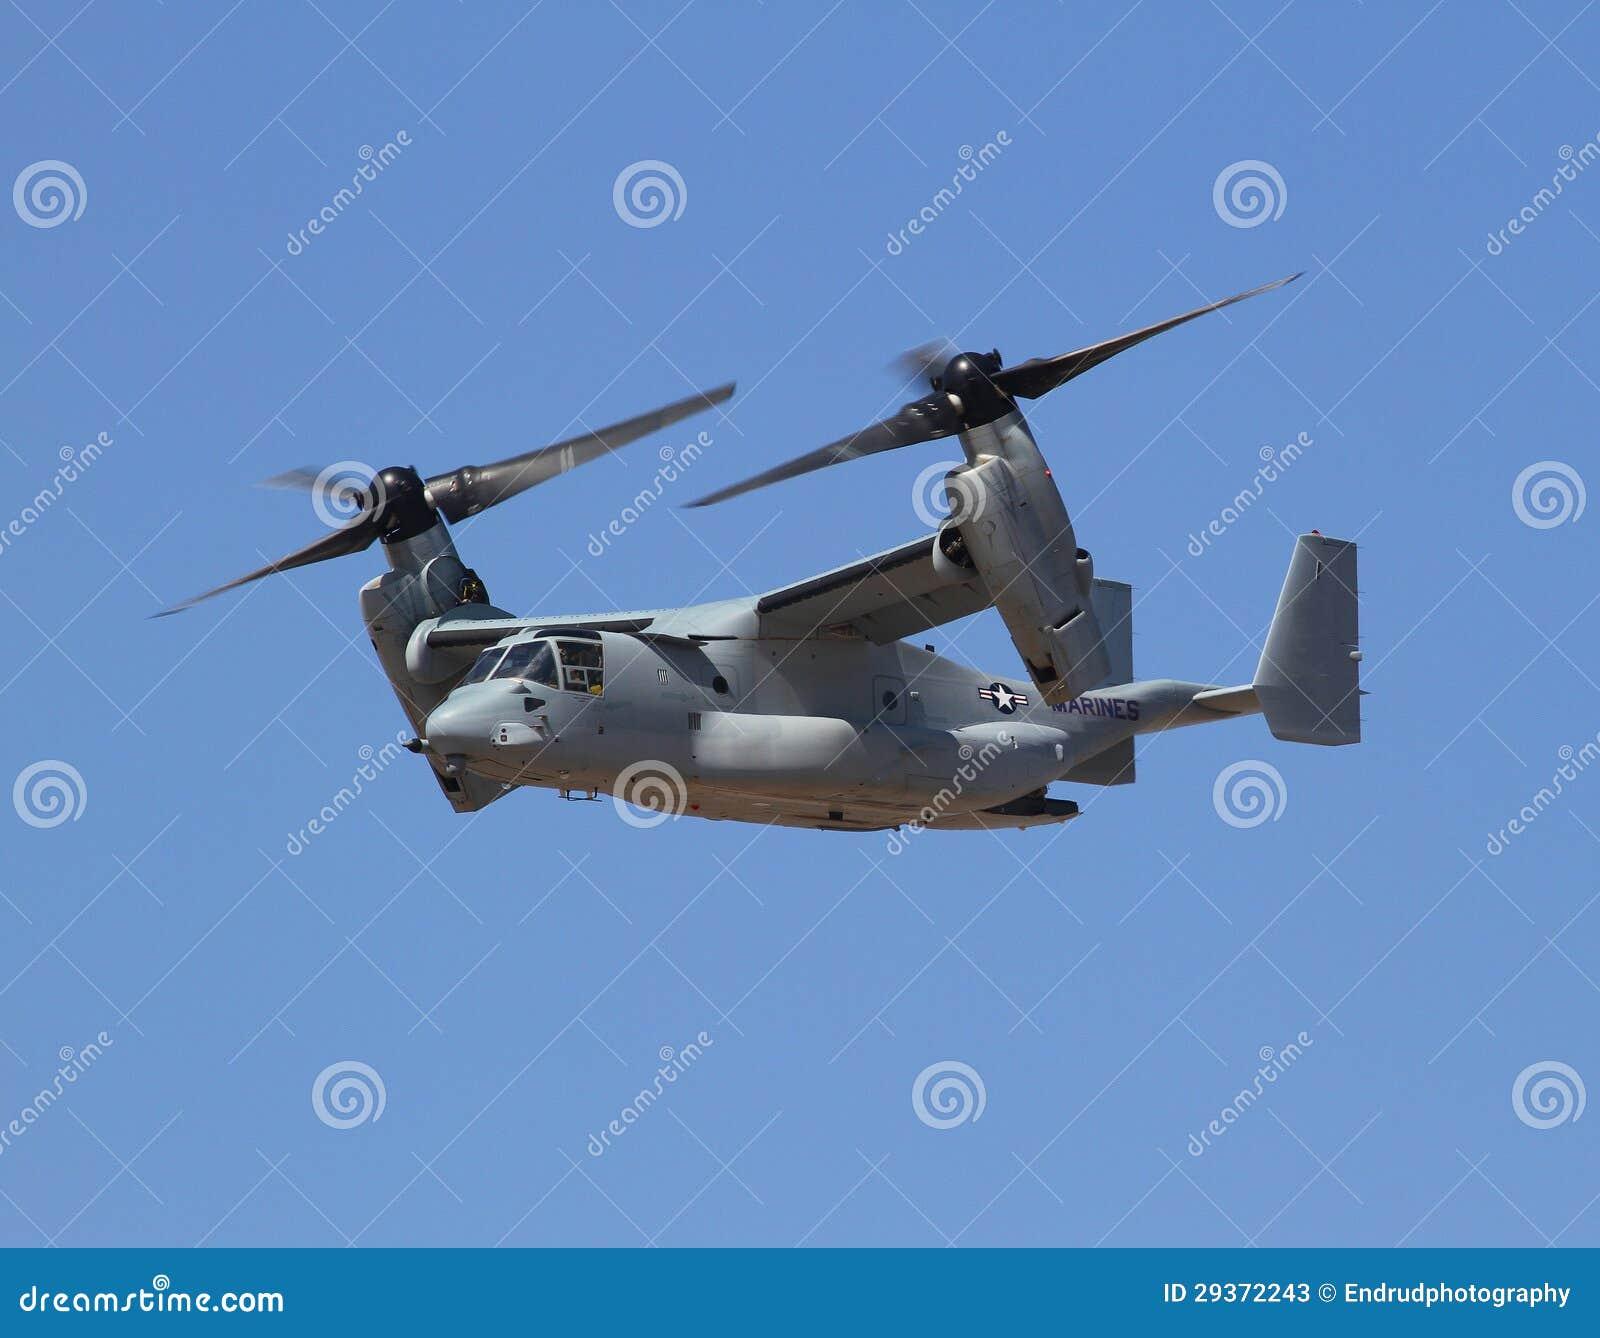 Osprey Elicottero : Osprey di bell boeing mv fotografie stock immagine